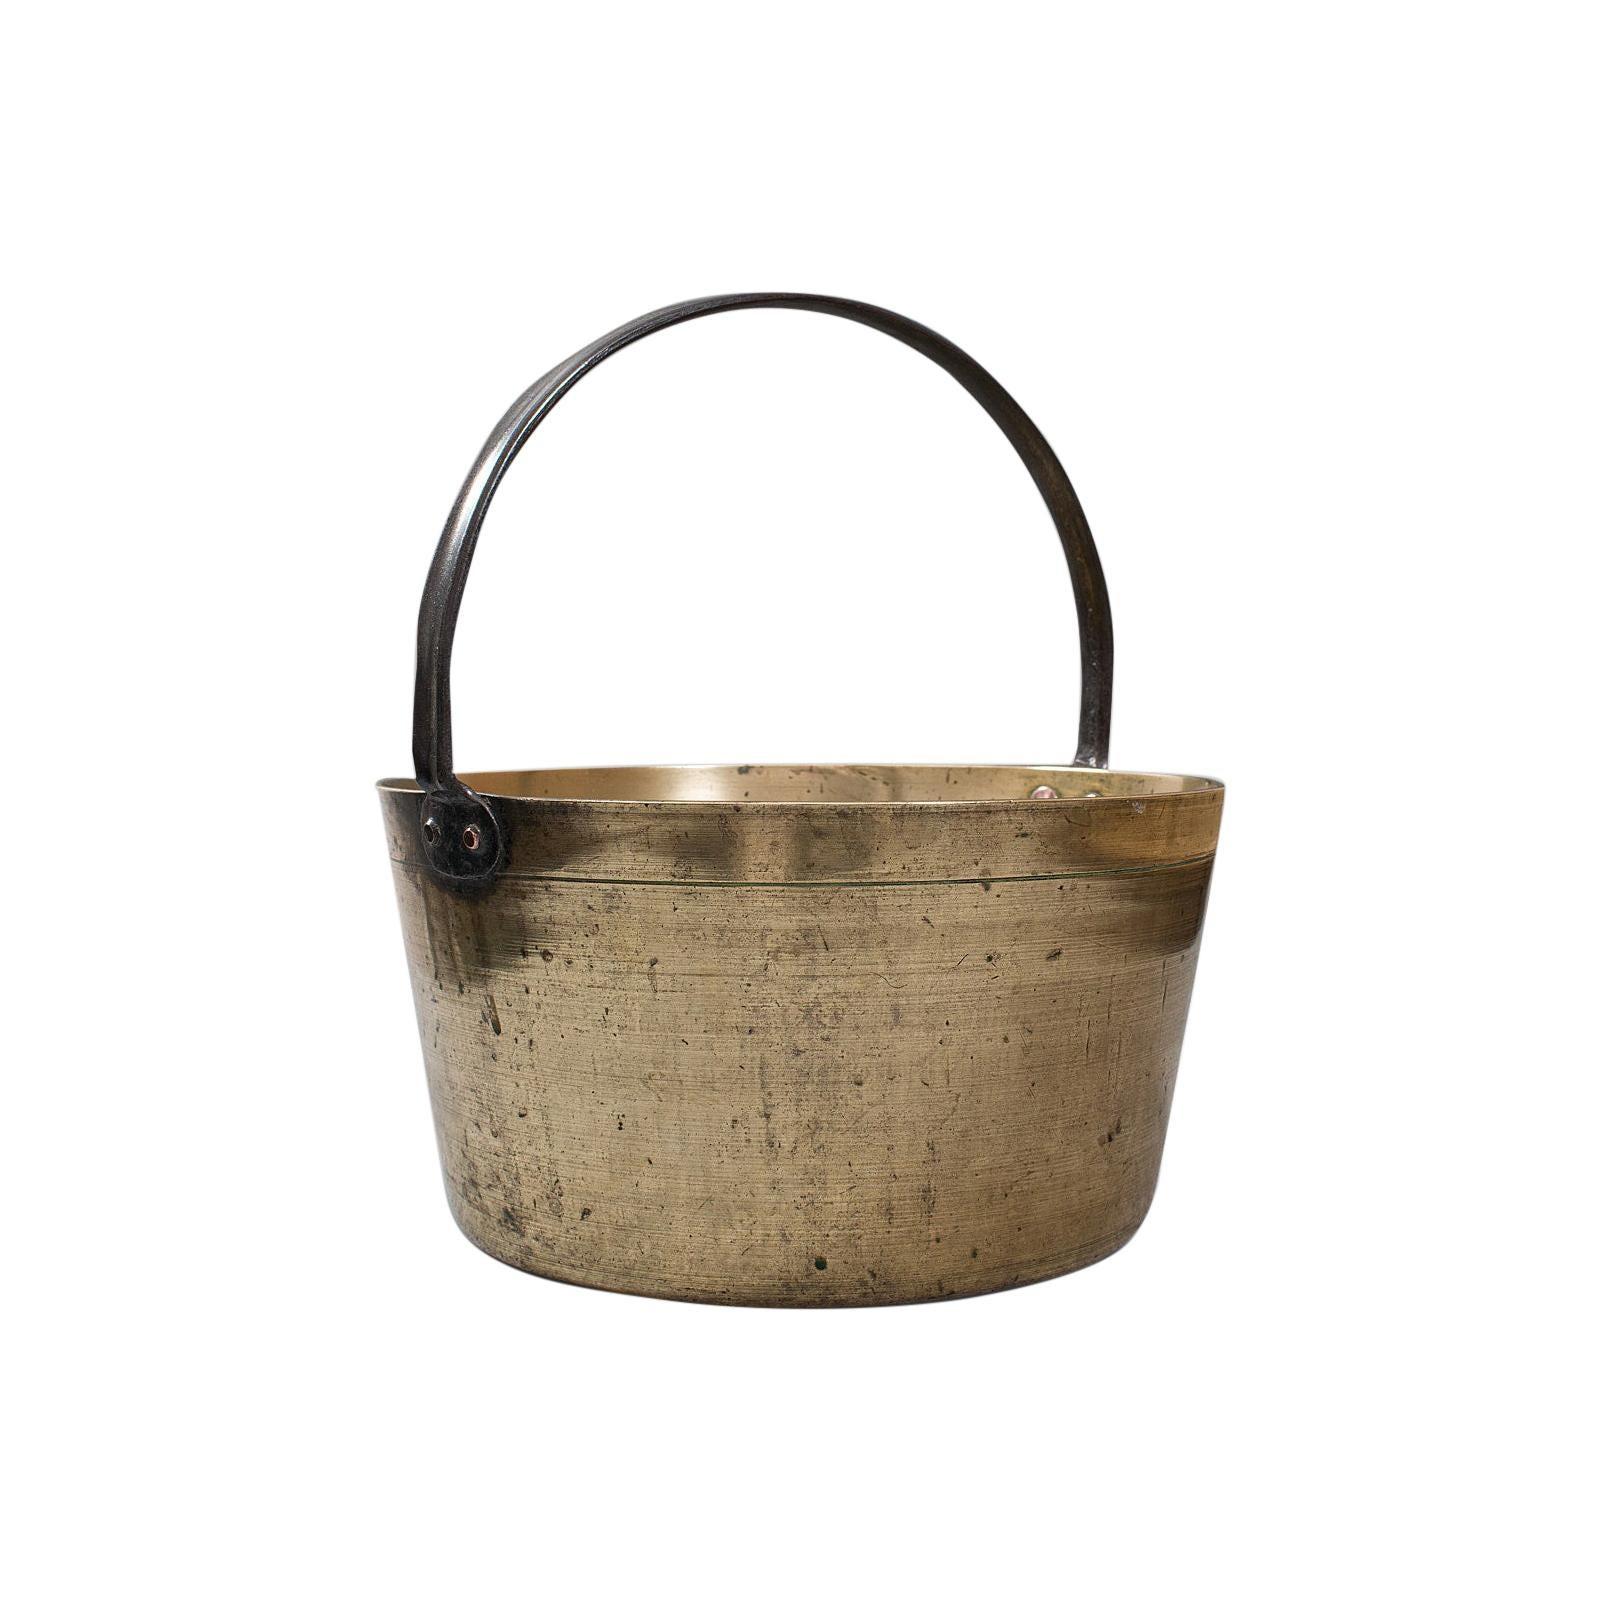 Antique Preserving Pan, English, Heavy Brass, Jam, Cooking Pot, Georgian, C 1800